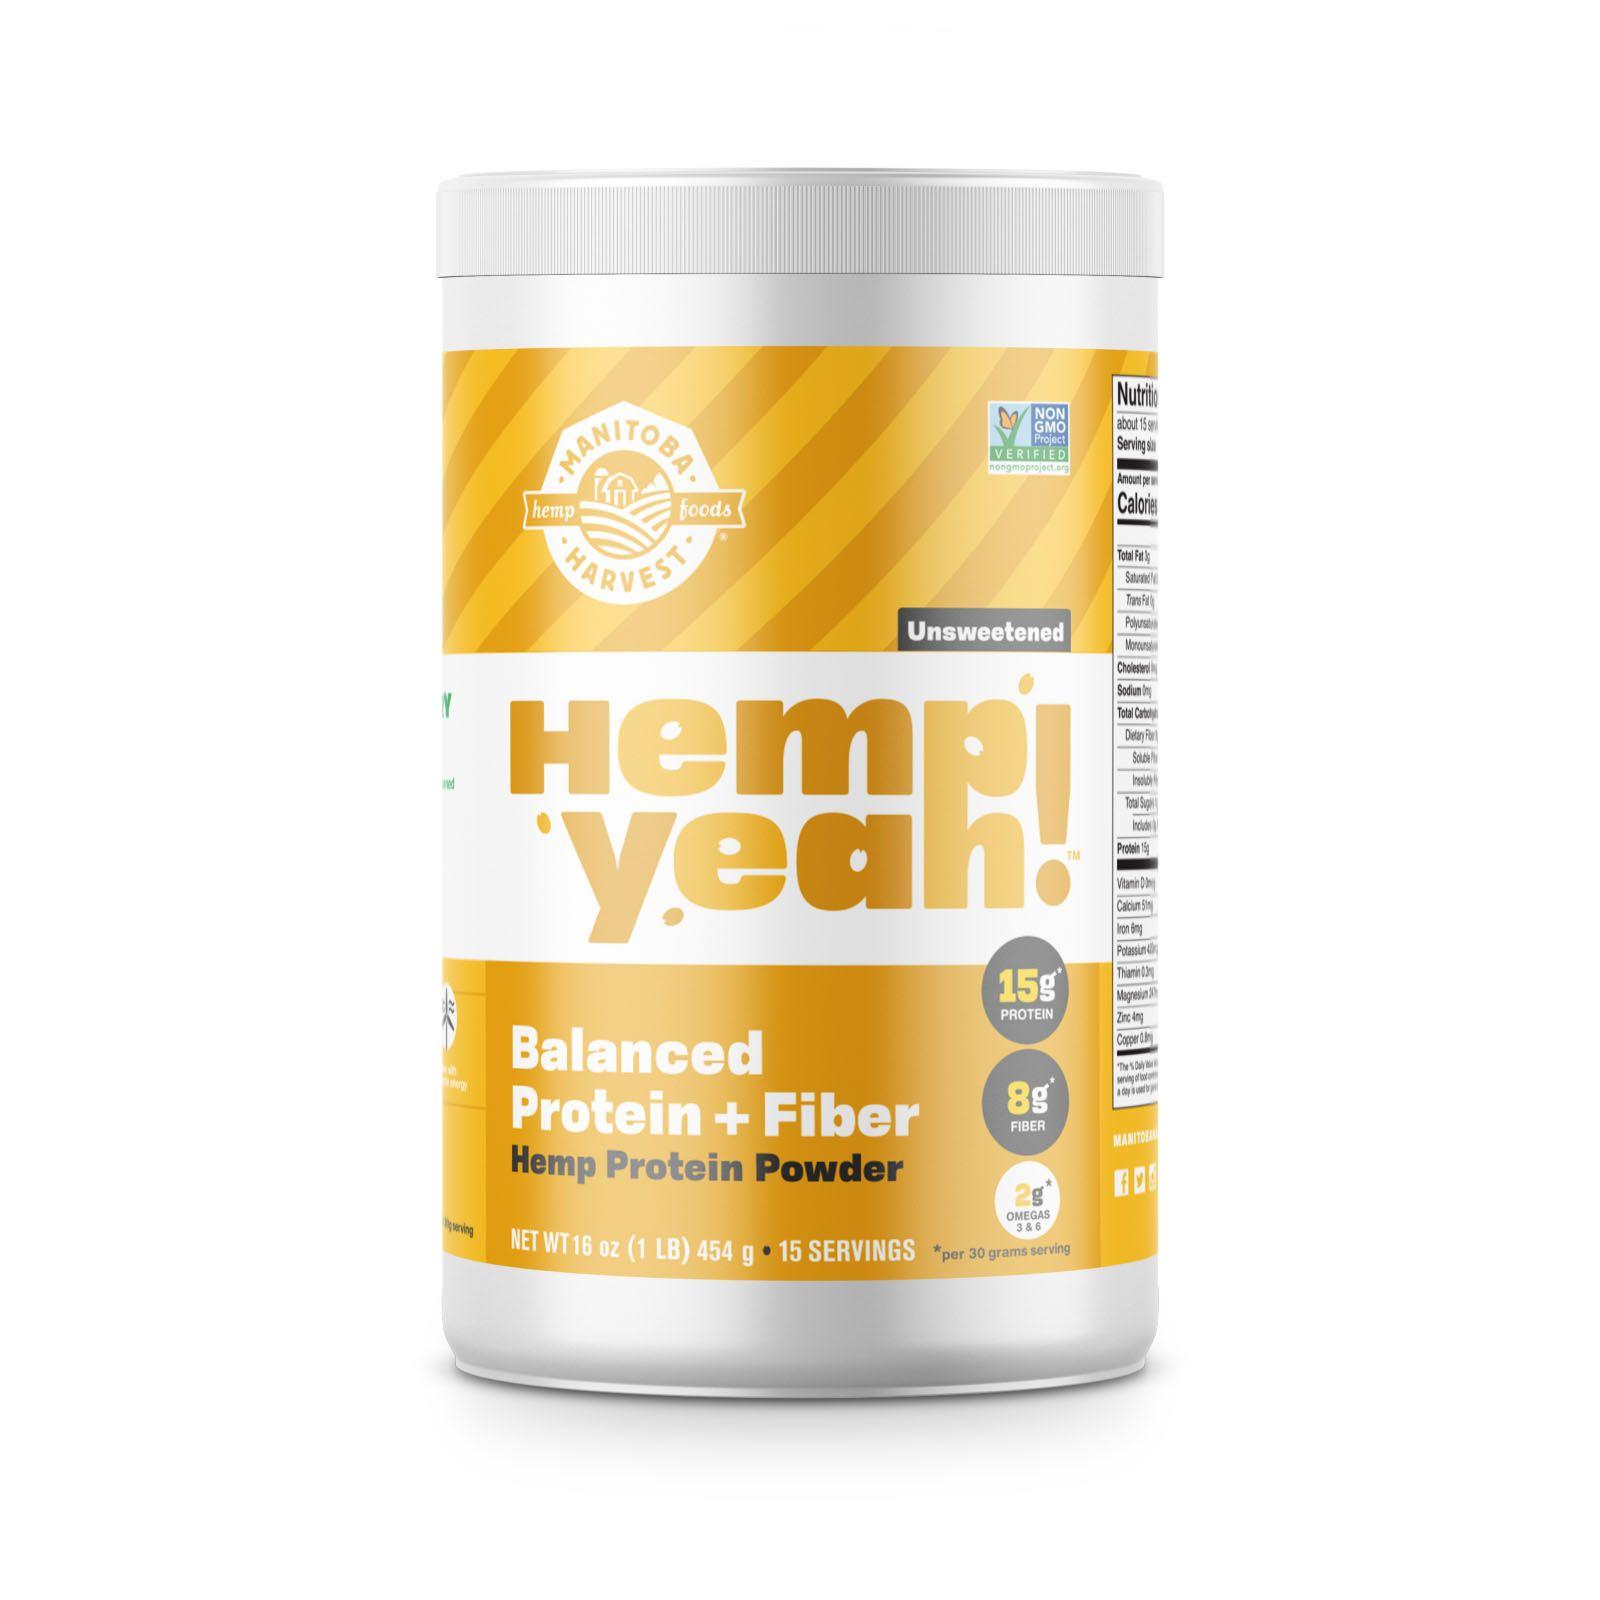 Hemp Yeah! Balanced Protein + Fiber Unsweetened 16 oz. (454 g)